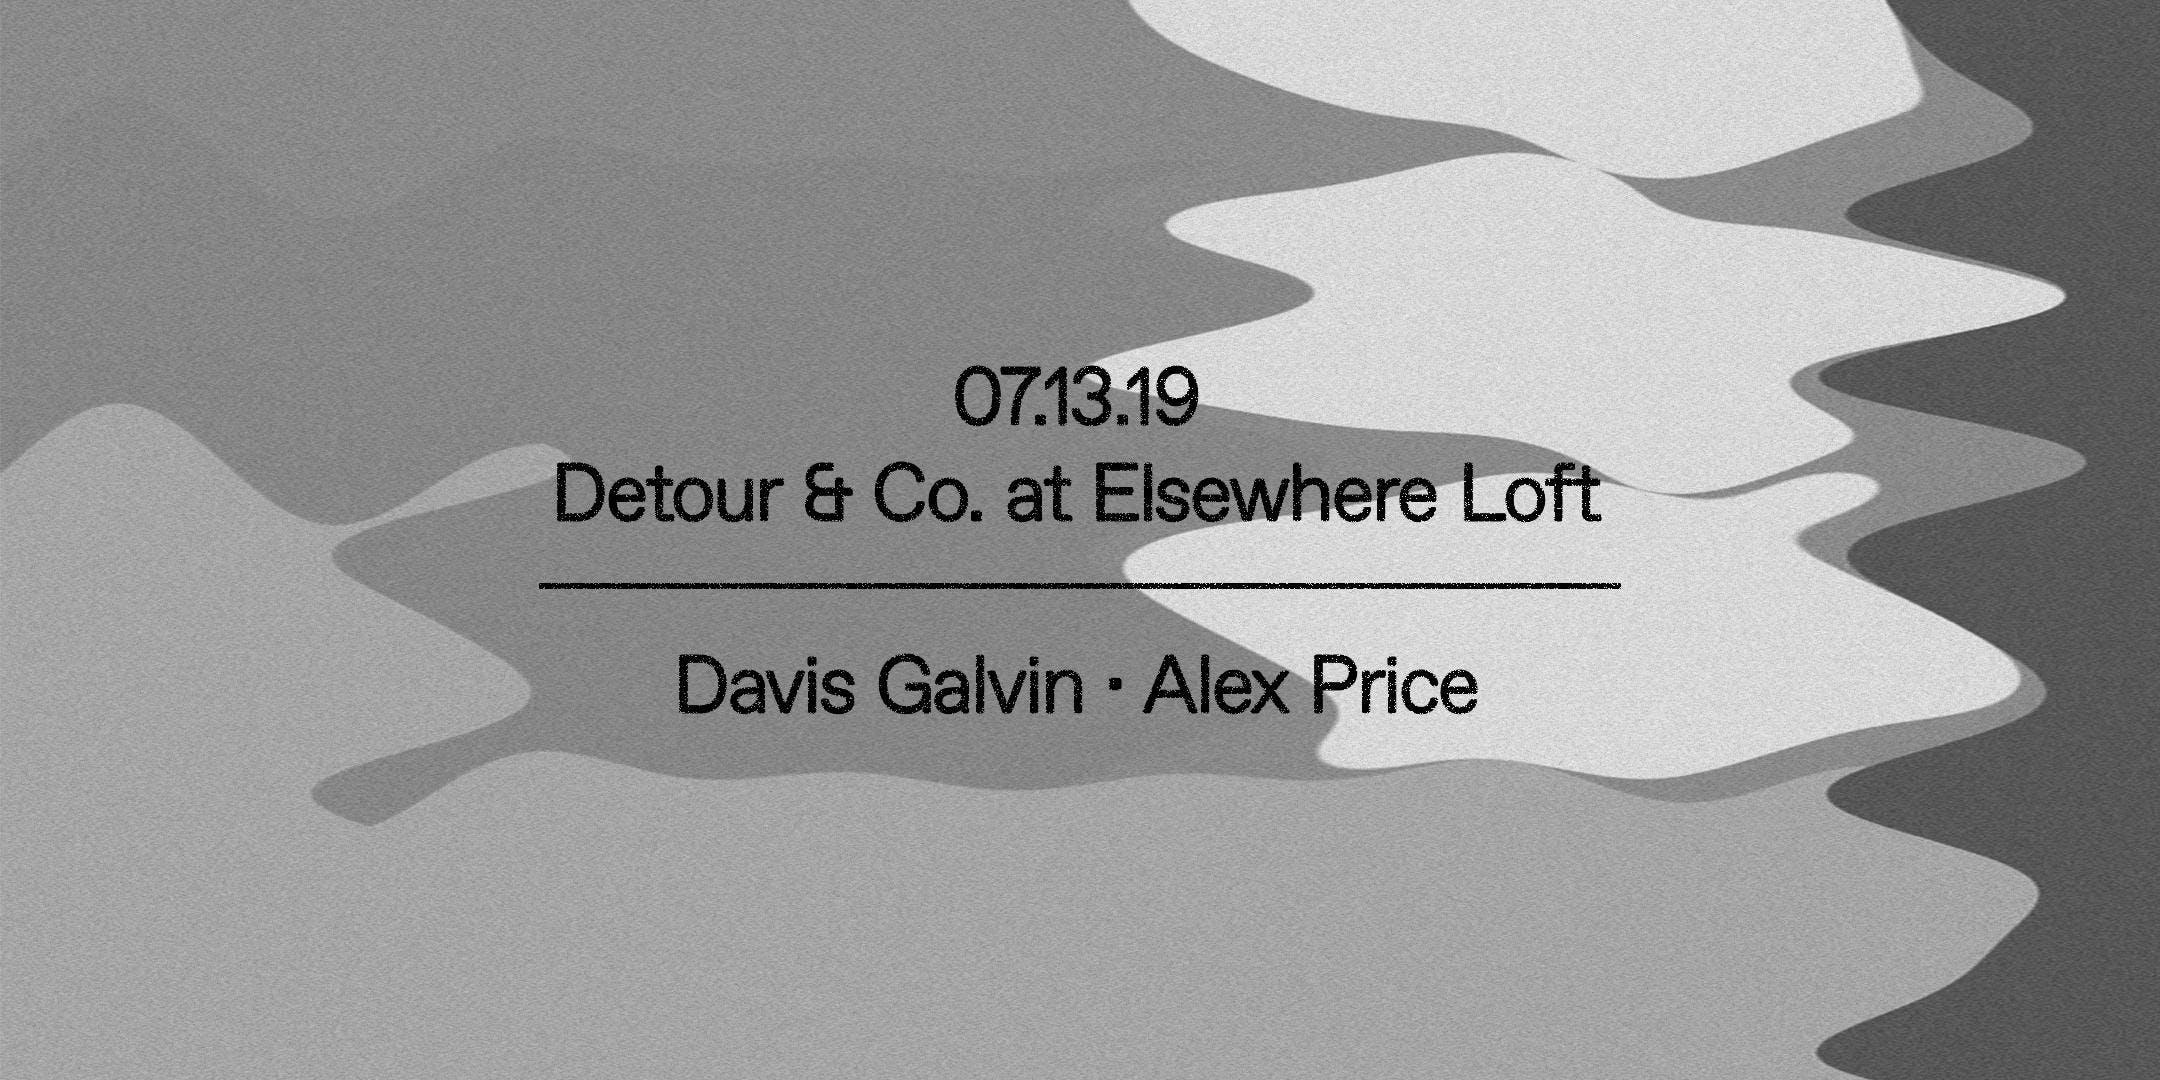 Detour & Co. w/ Davis Galvin & Alex Price